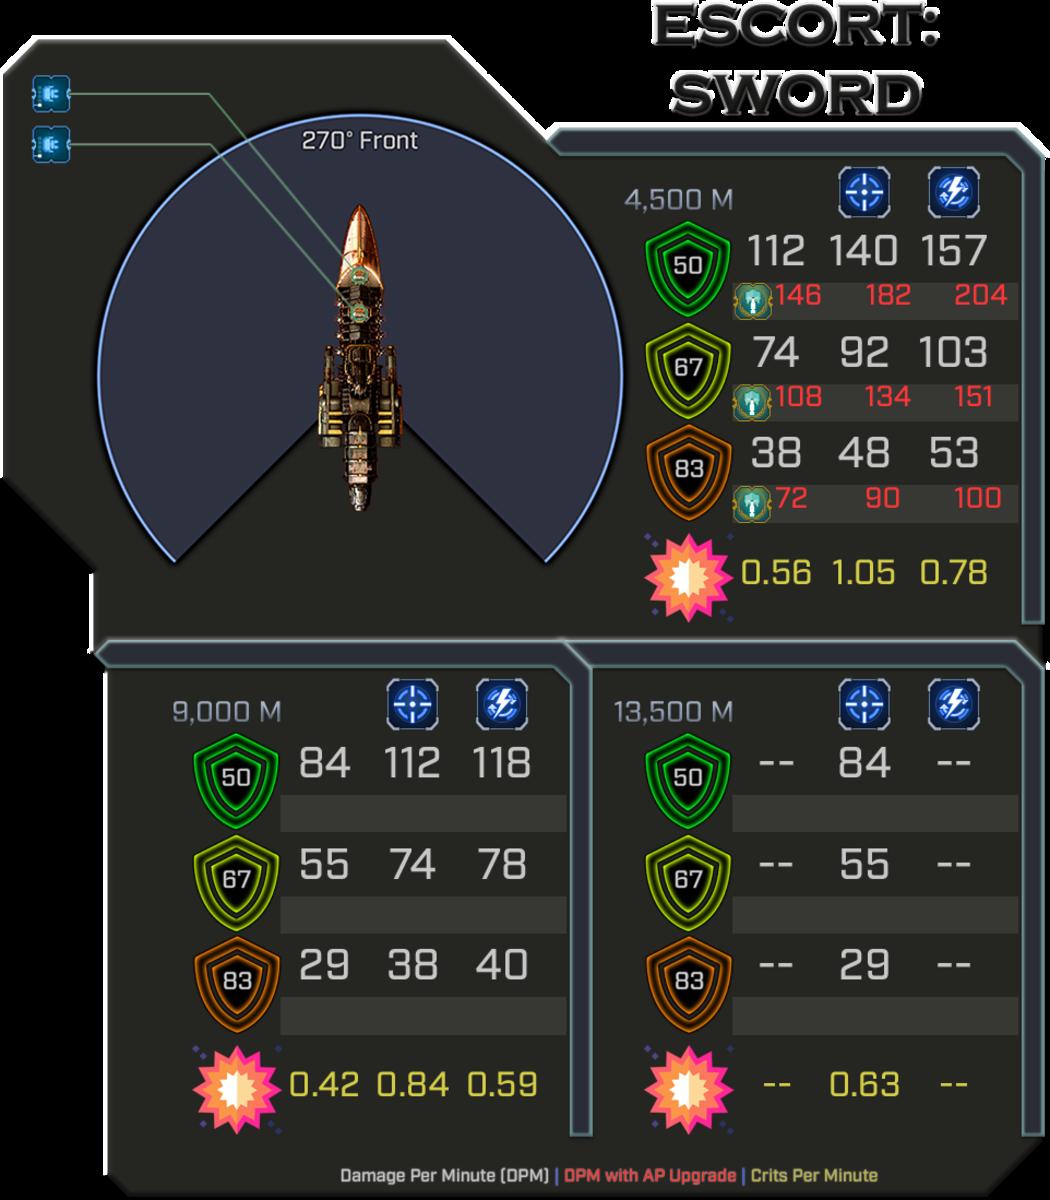 Sword - Weapon Damage Profile